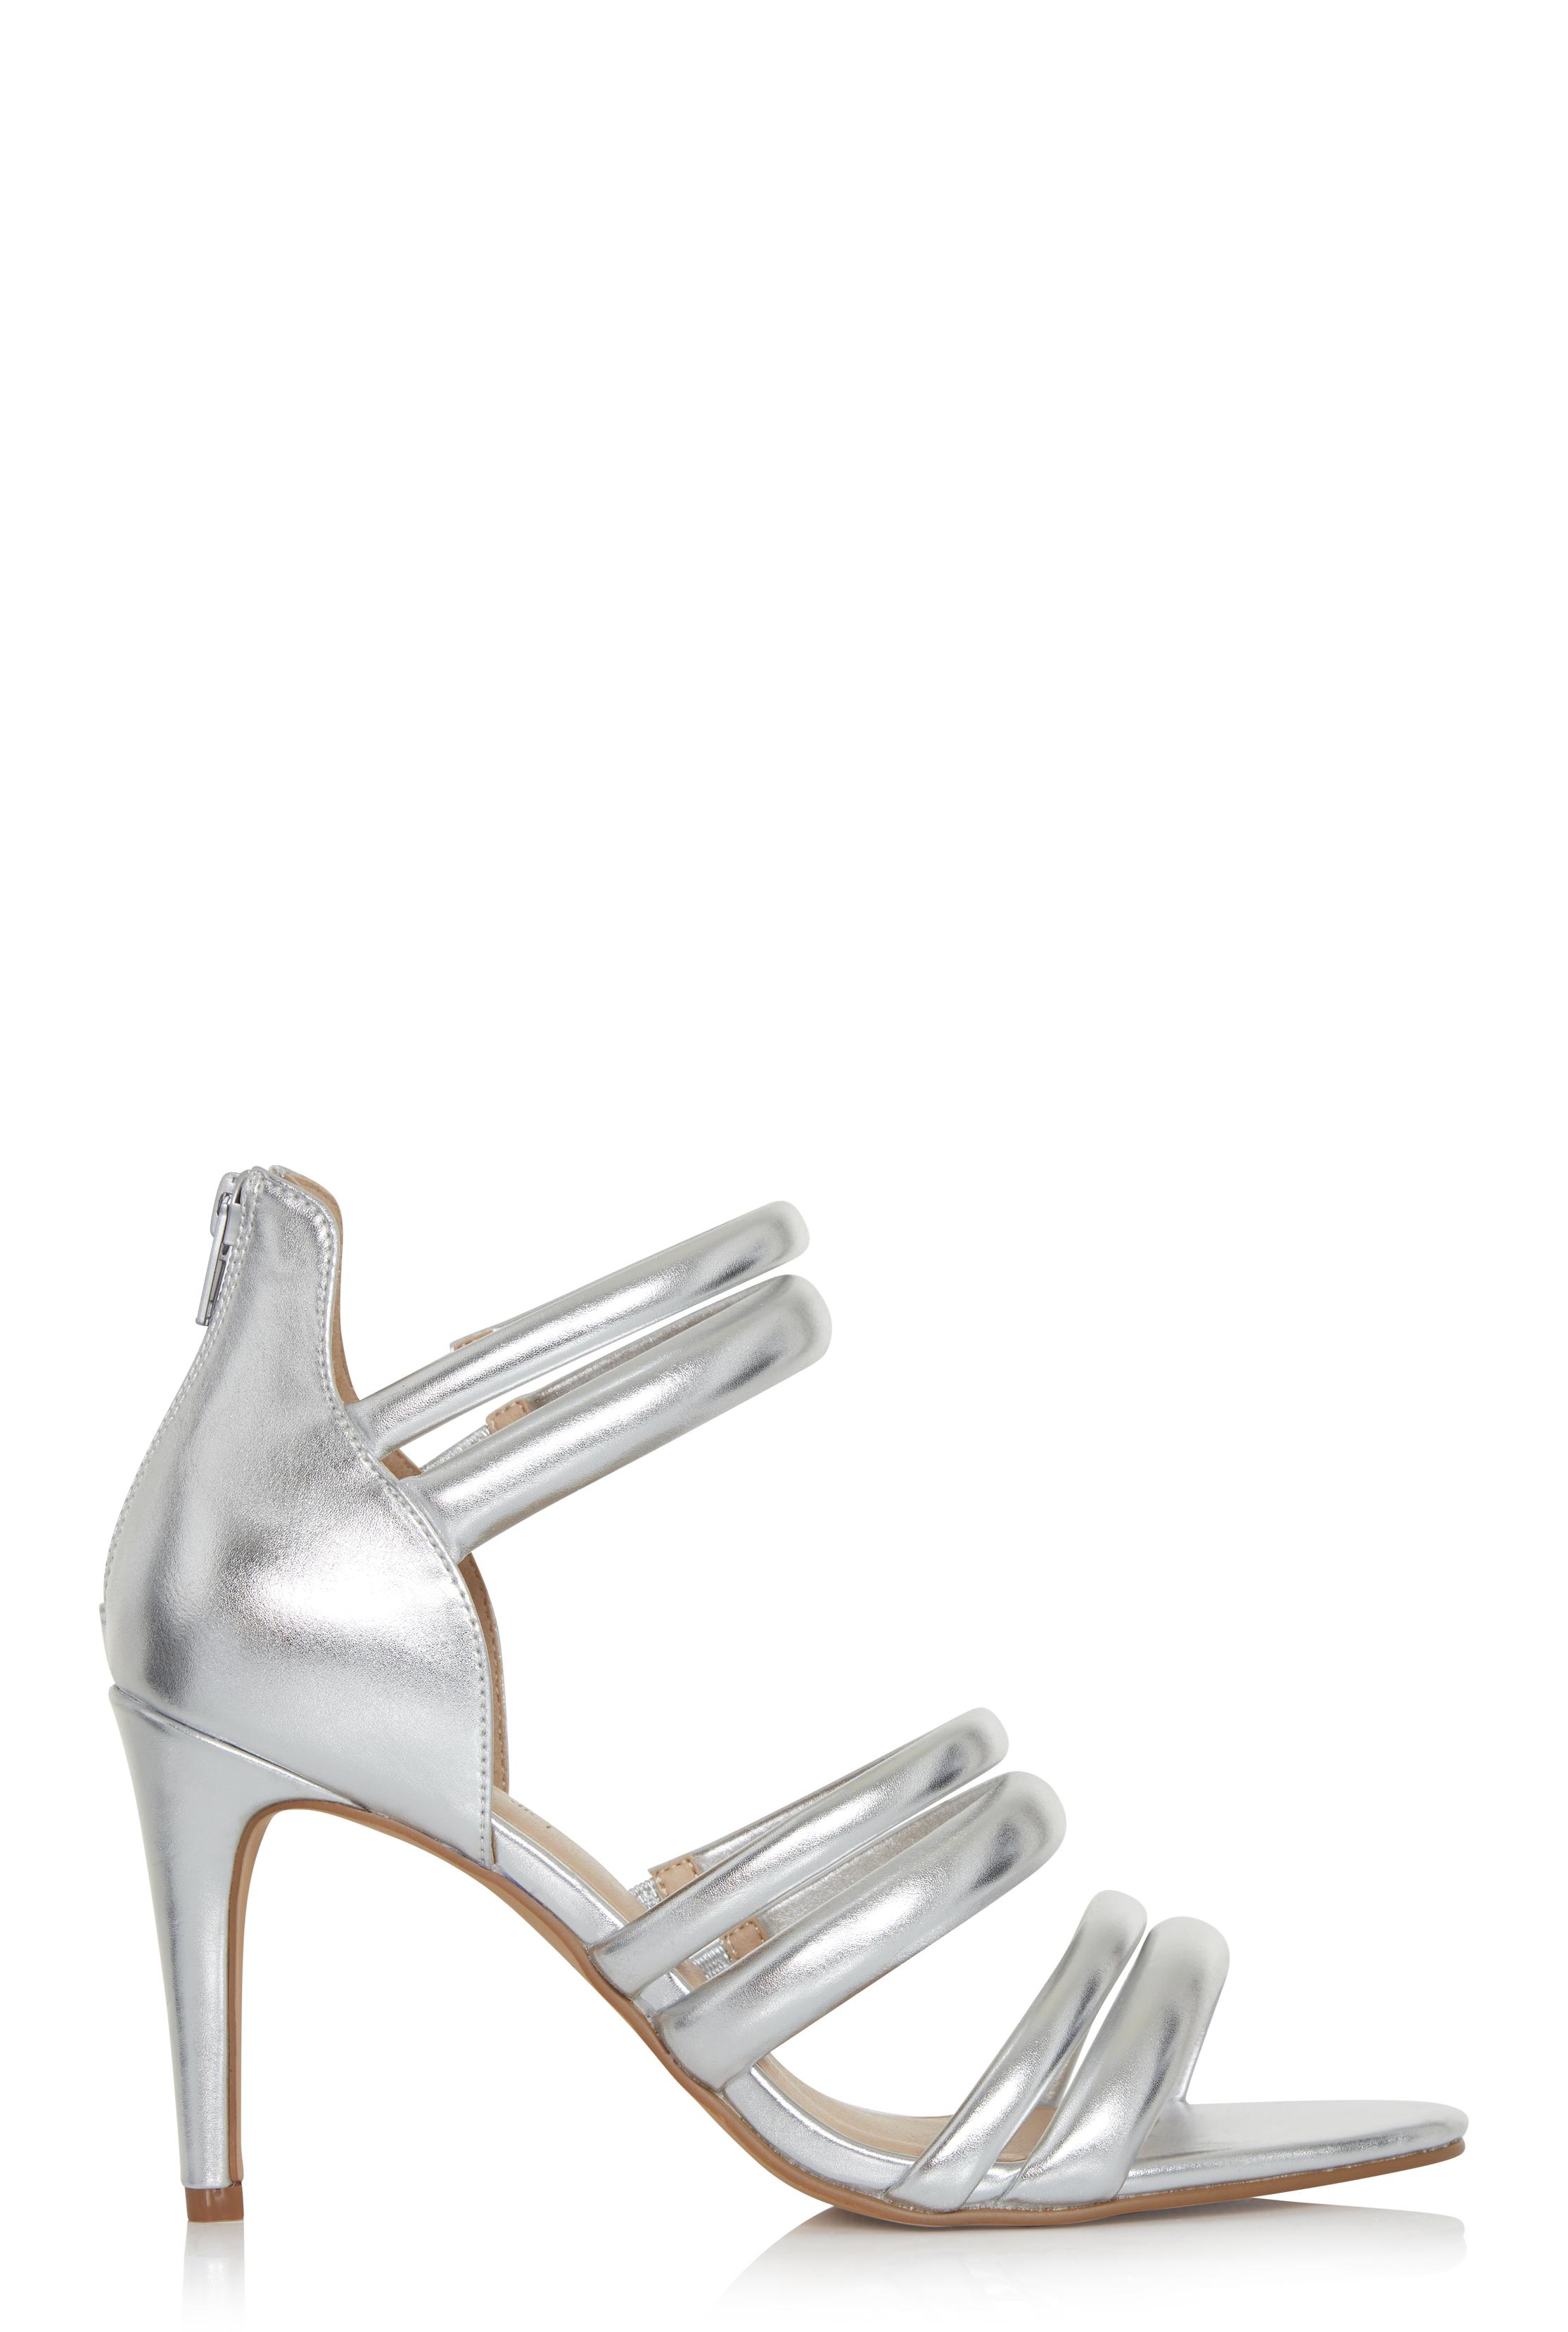 LTS Silver Rosetta Strappy Heels